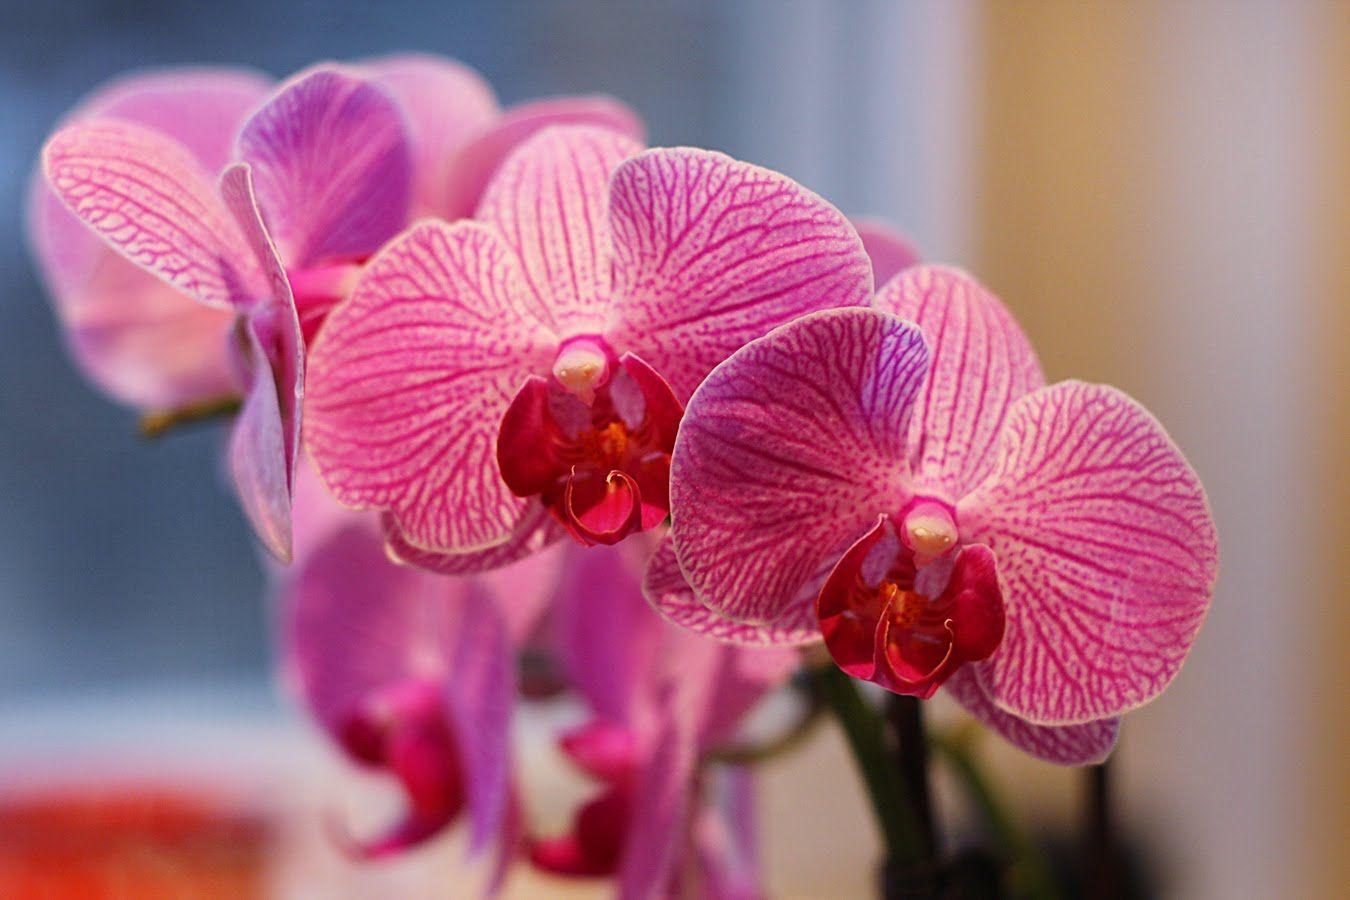 Amazing Deep Pink Orchid Wallpaper High Resolution High